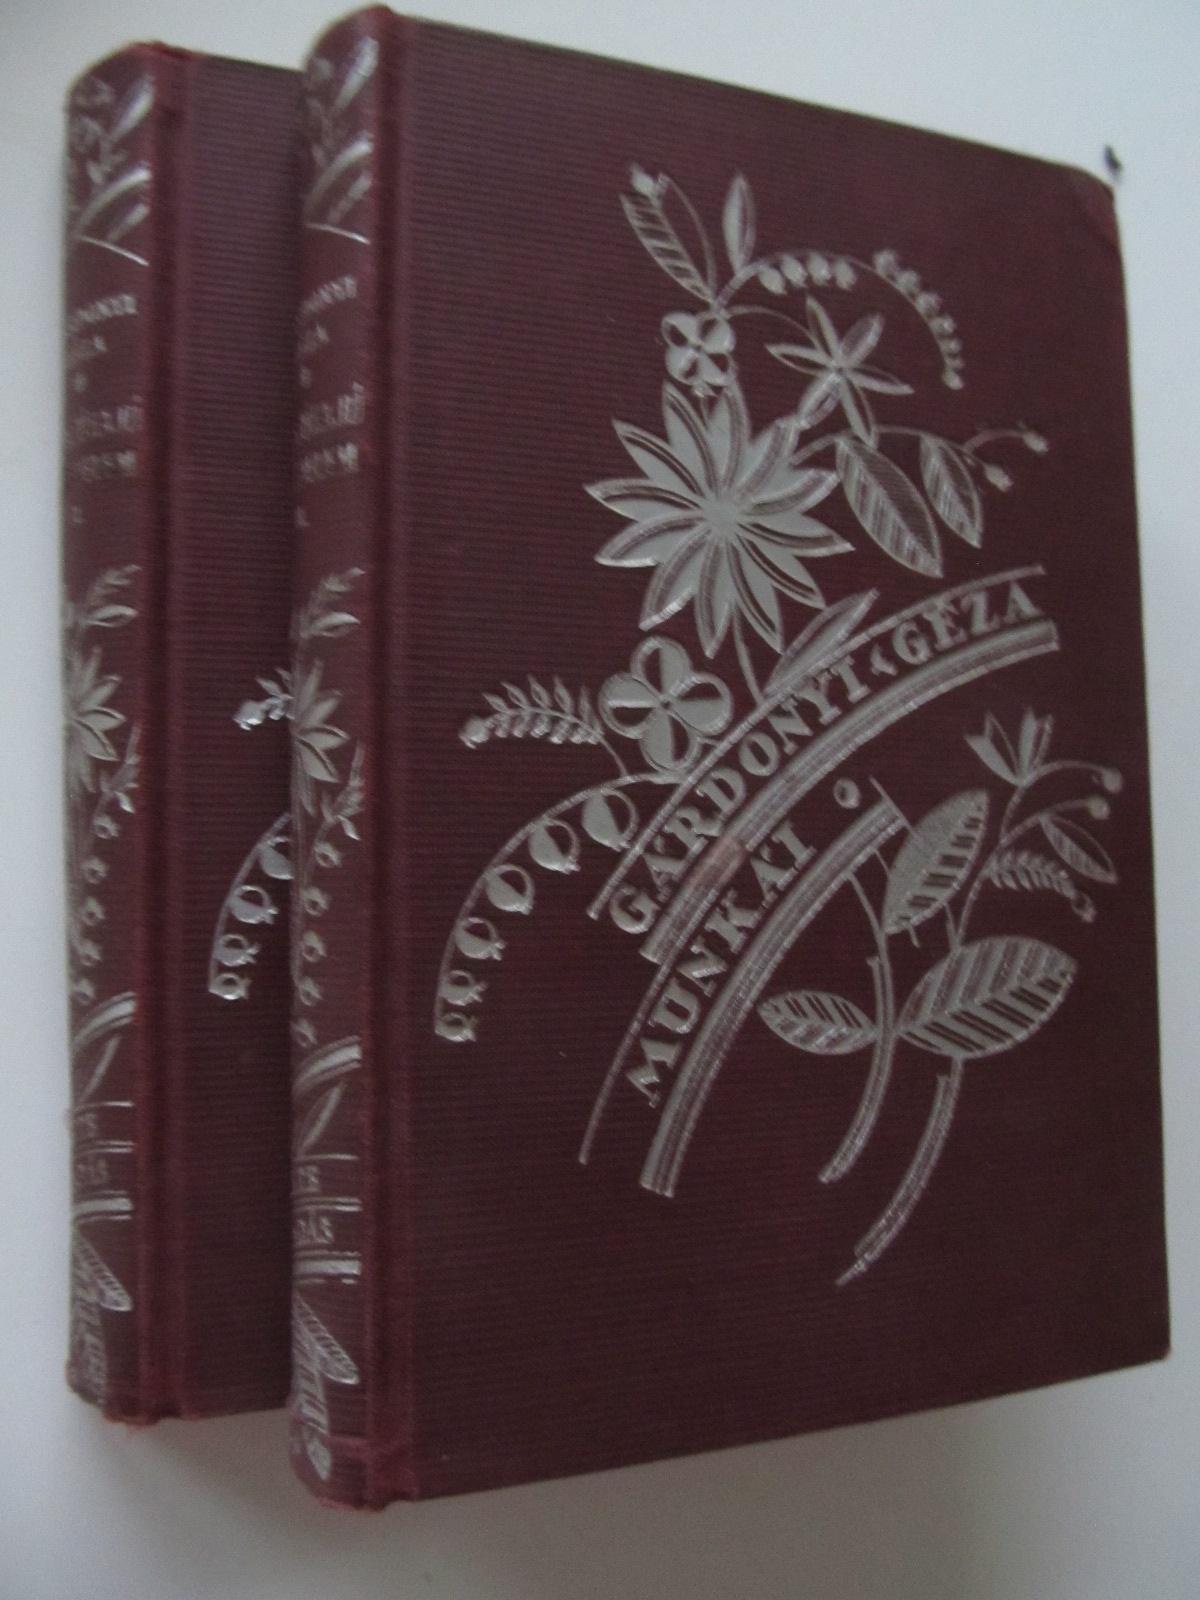 Hosszuhaju veszedelem (2 vol.) - Gardonyi Geza | Detalii carte